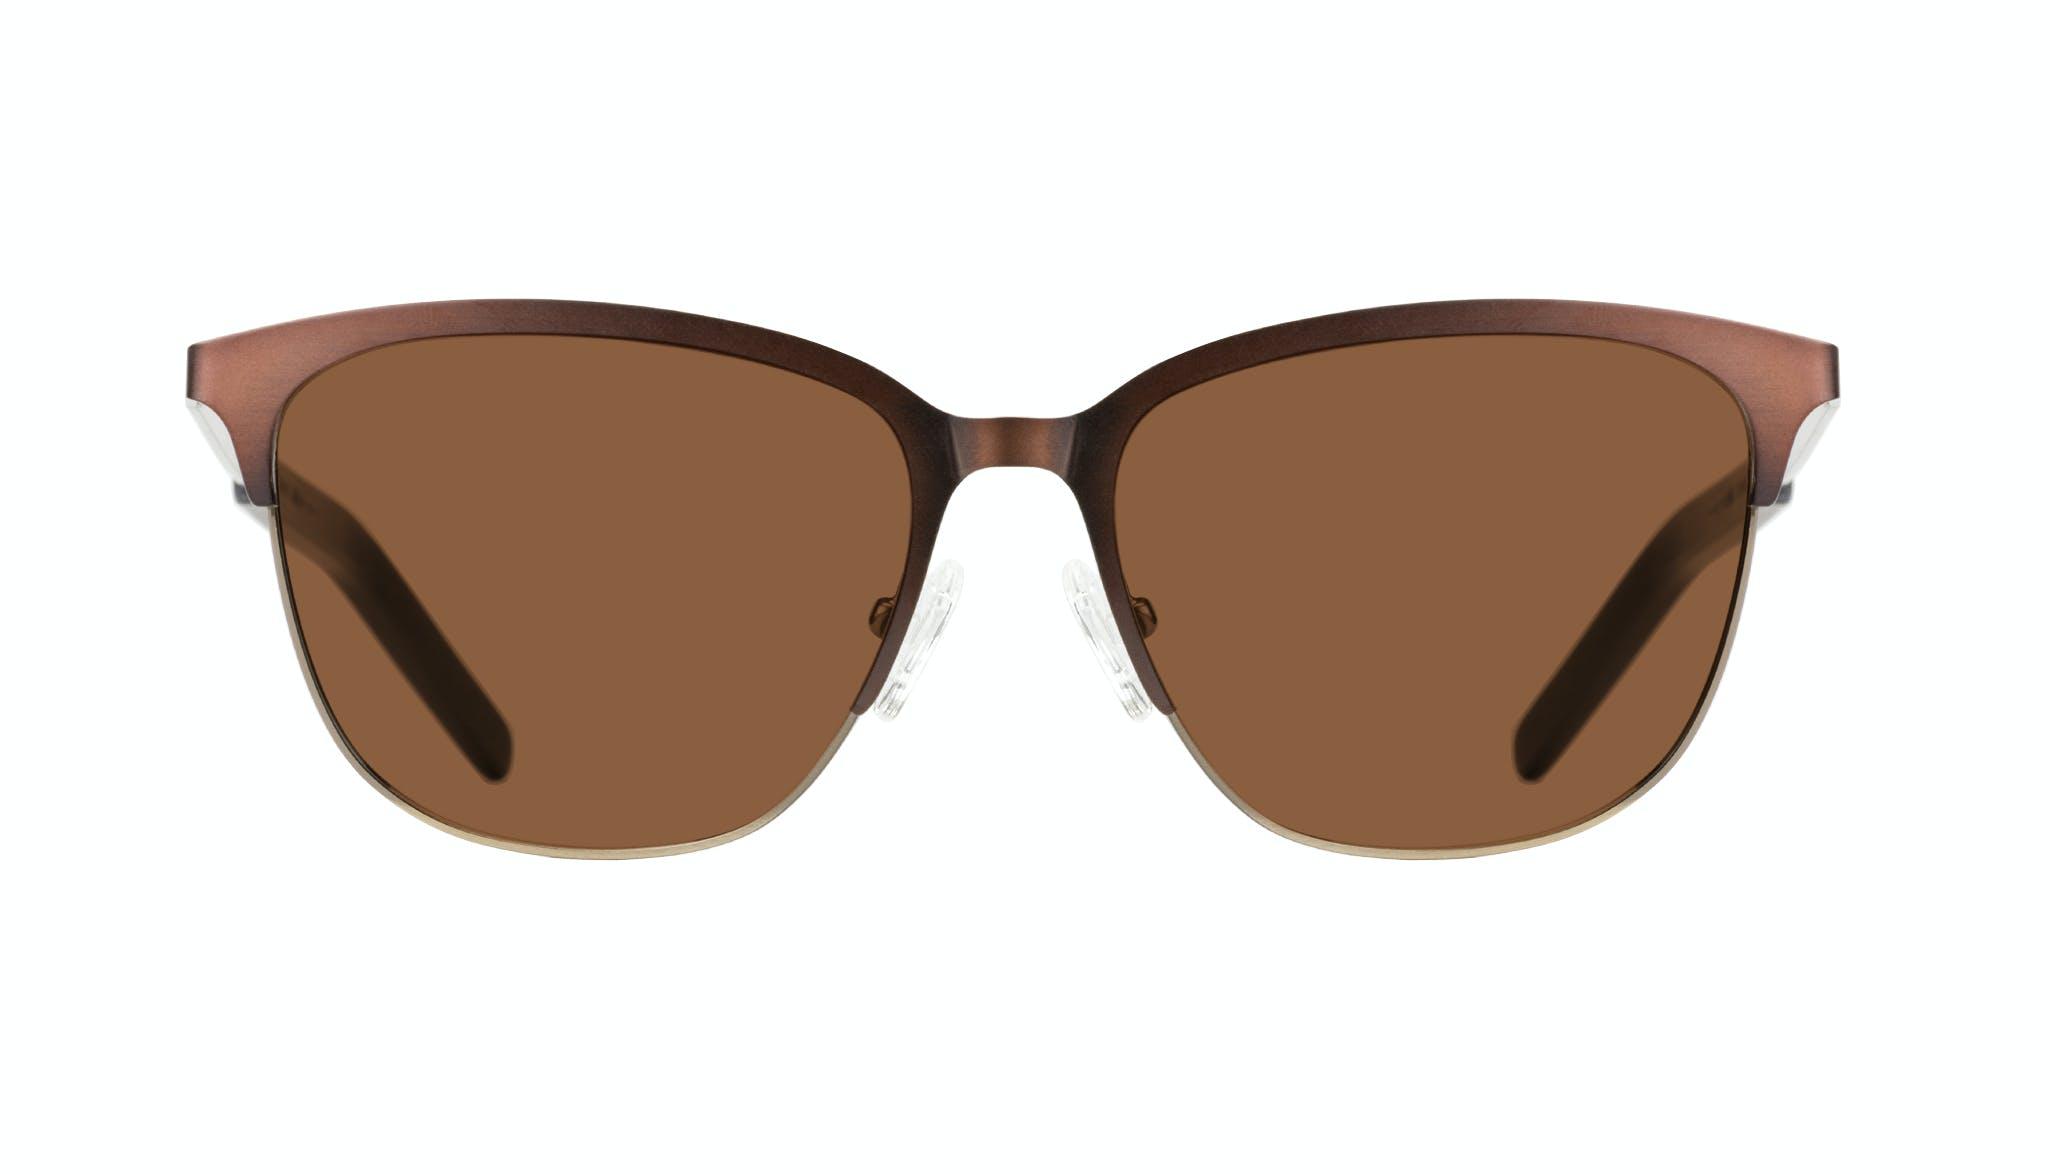 Affordable Fashion Glasses Rectangle Eyeglasses Men Legacy Mud Gold